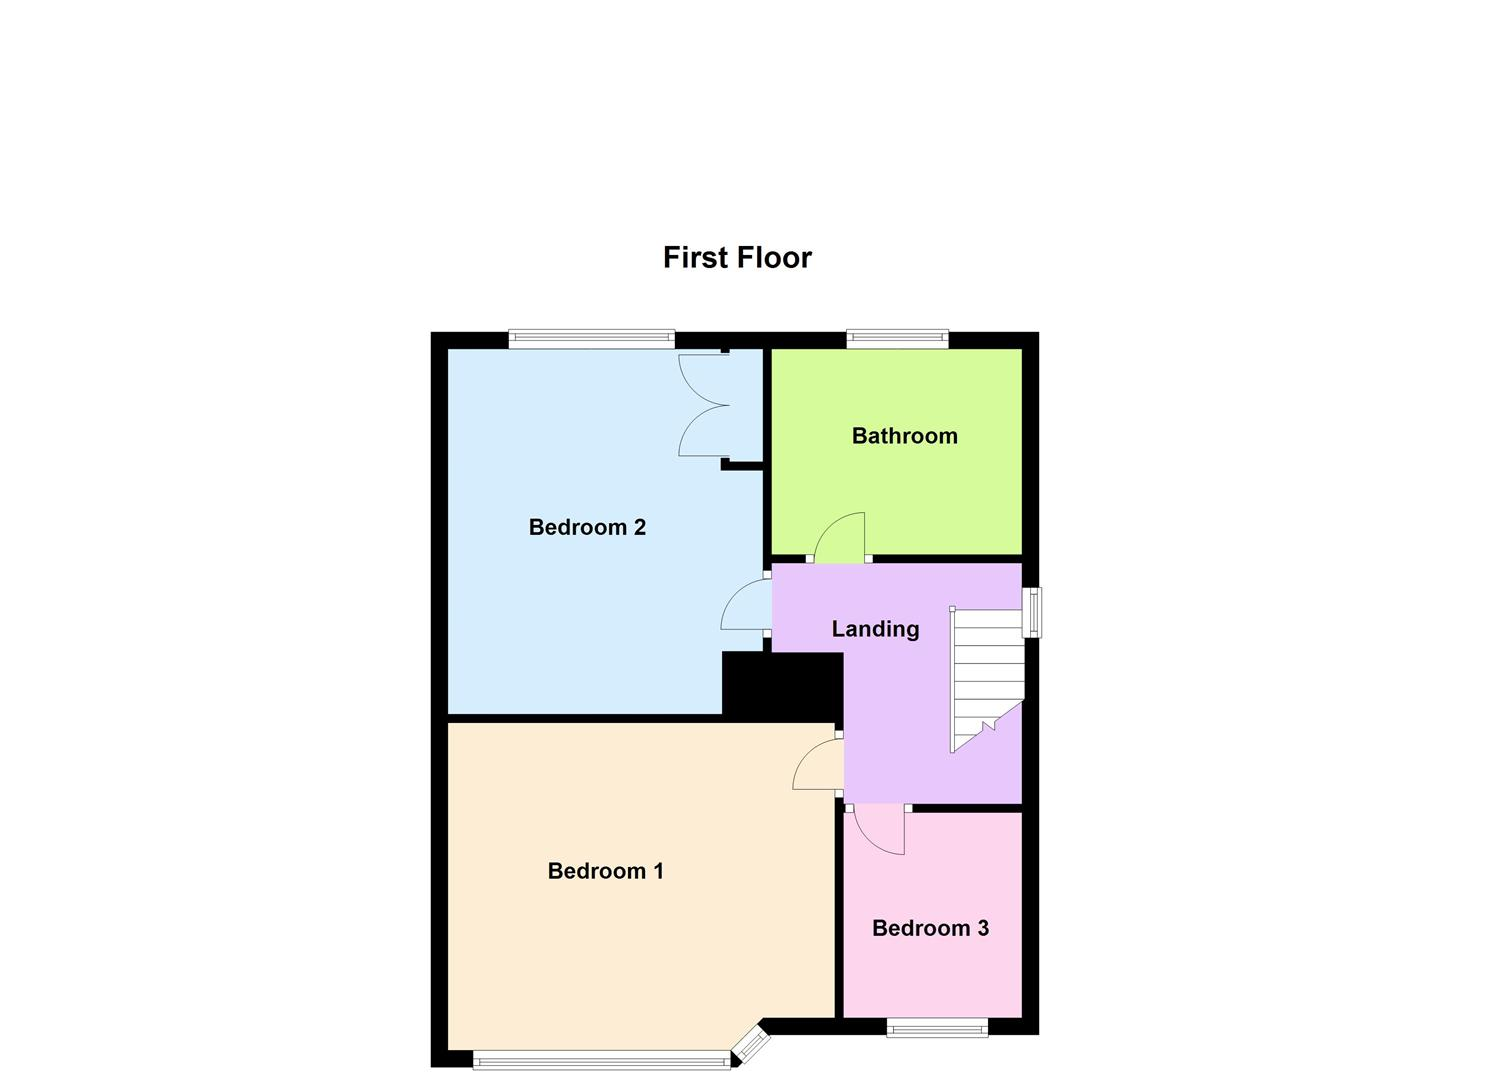 3 bedroom semi detached house for sale in blaby 10x12 bedroom design tips 10x12 bedroom layout